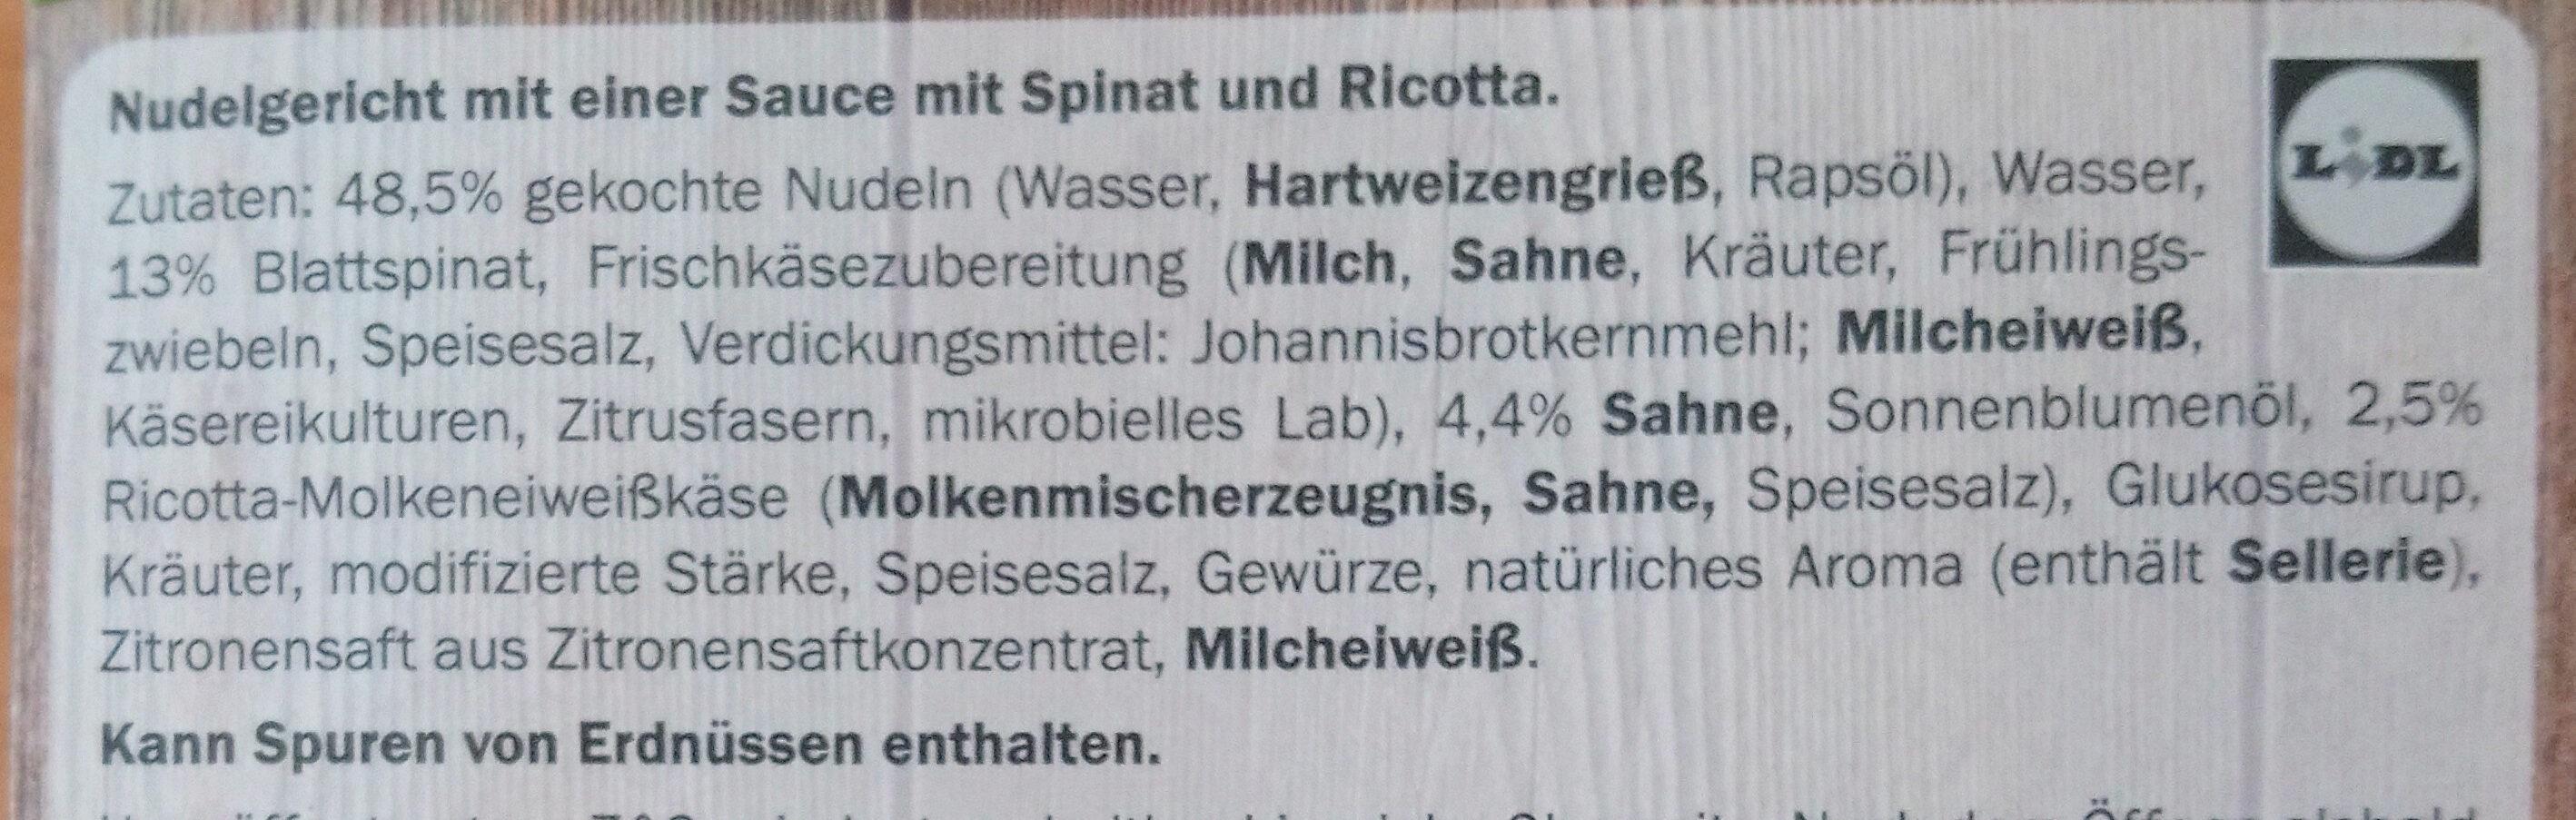 Tagliatelle Spinat-Ricotta - Ingredients